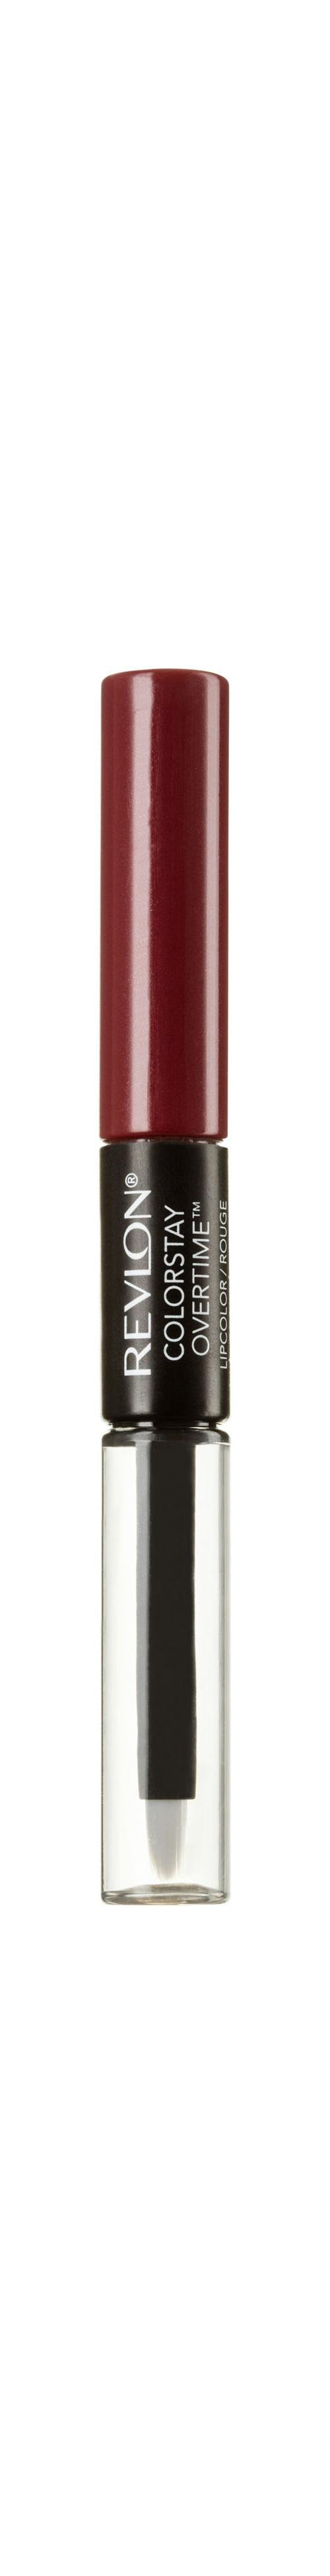 Revlon Colorstay Overtime™ Lipcolor Ultimate Wine